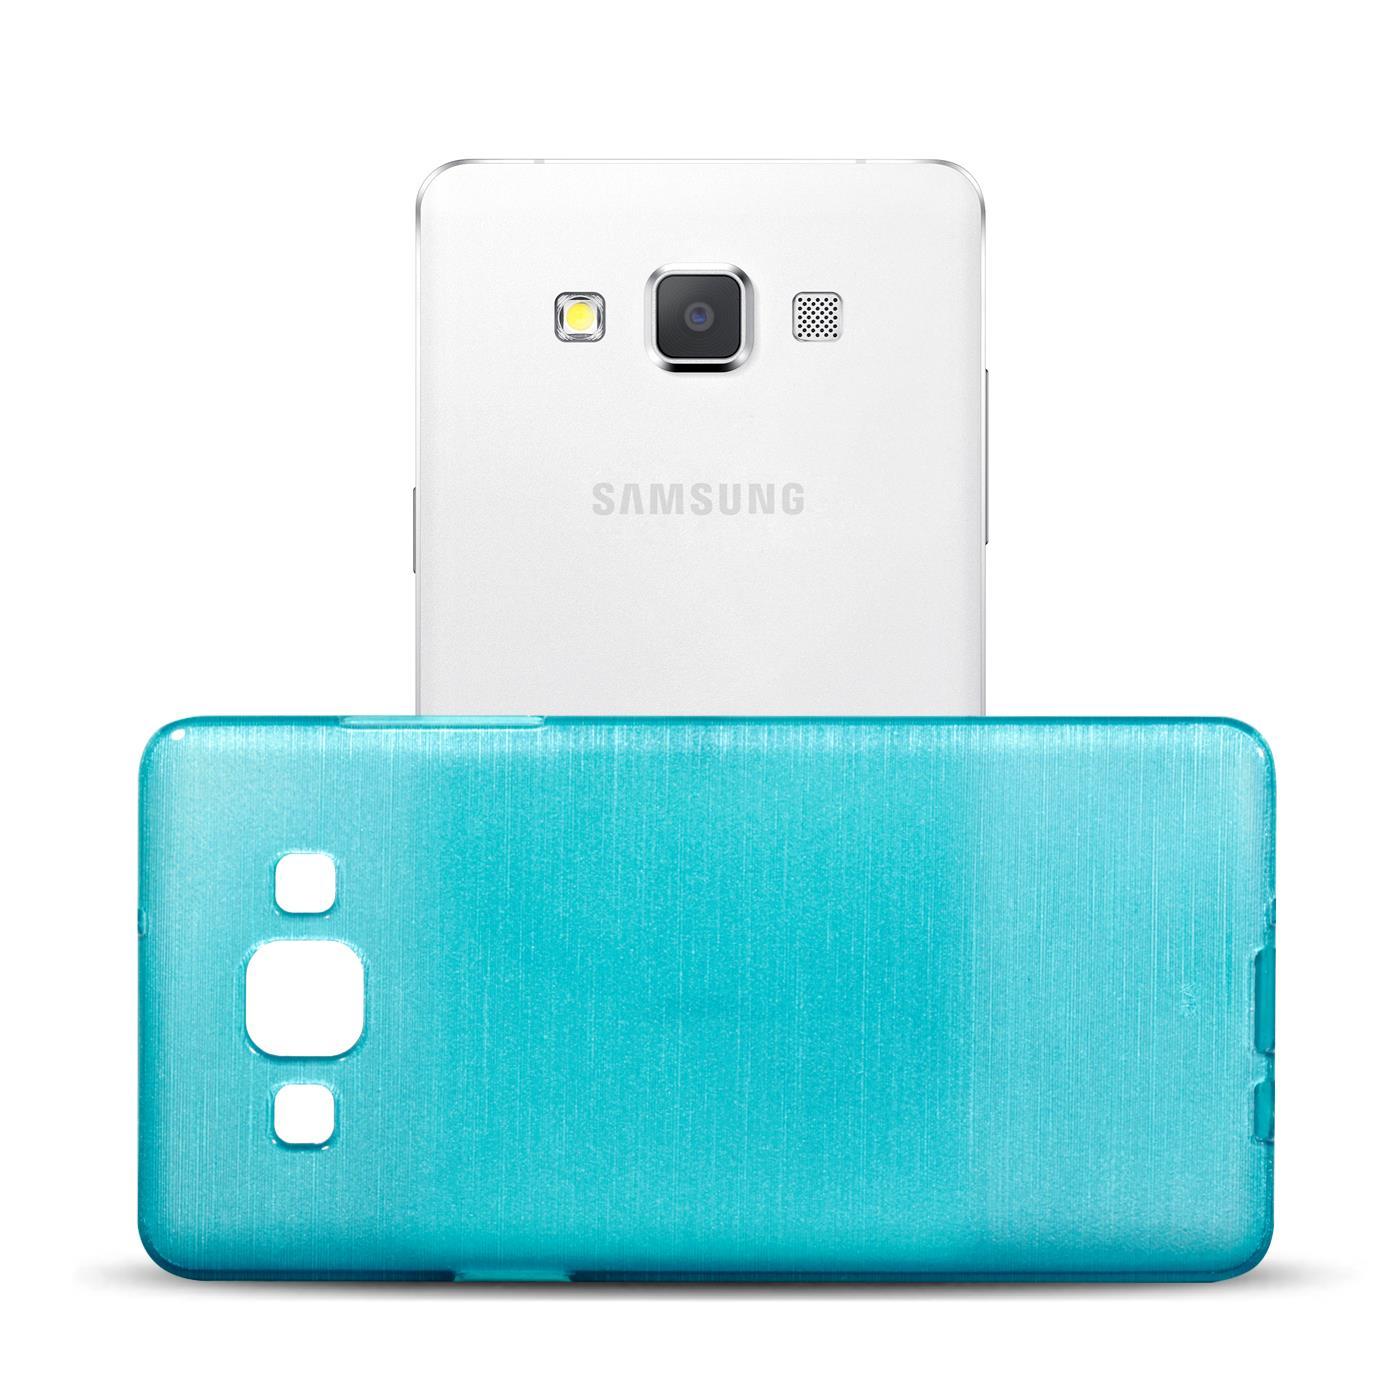 Silikon-Bumper-Case-Samsung-Galaxy-a5-2015-Ultra-Slim-Stossfeste-Rueckschale Indexbild 8